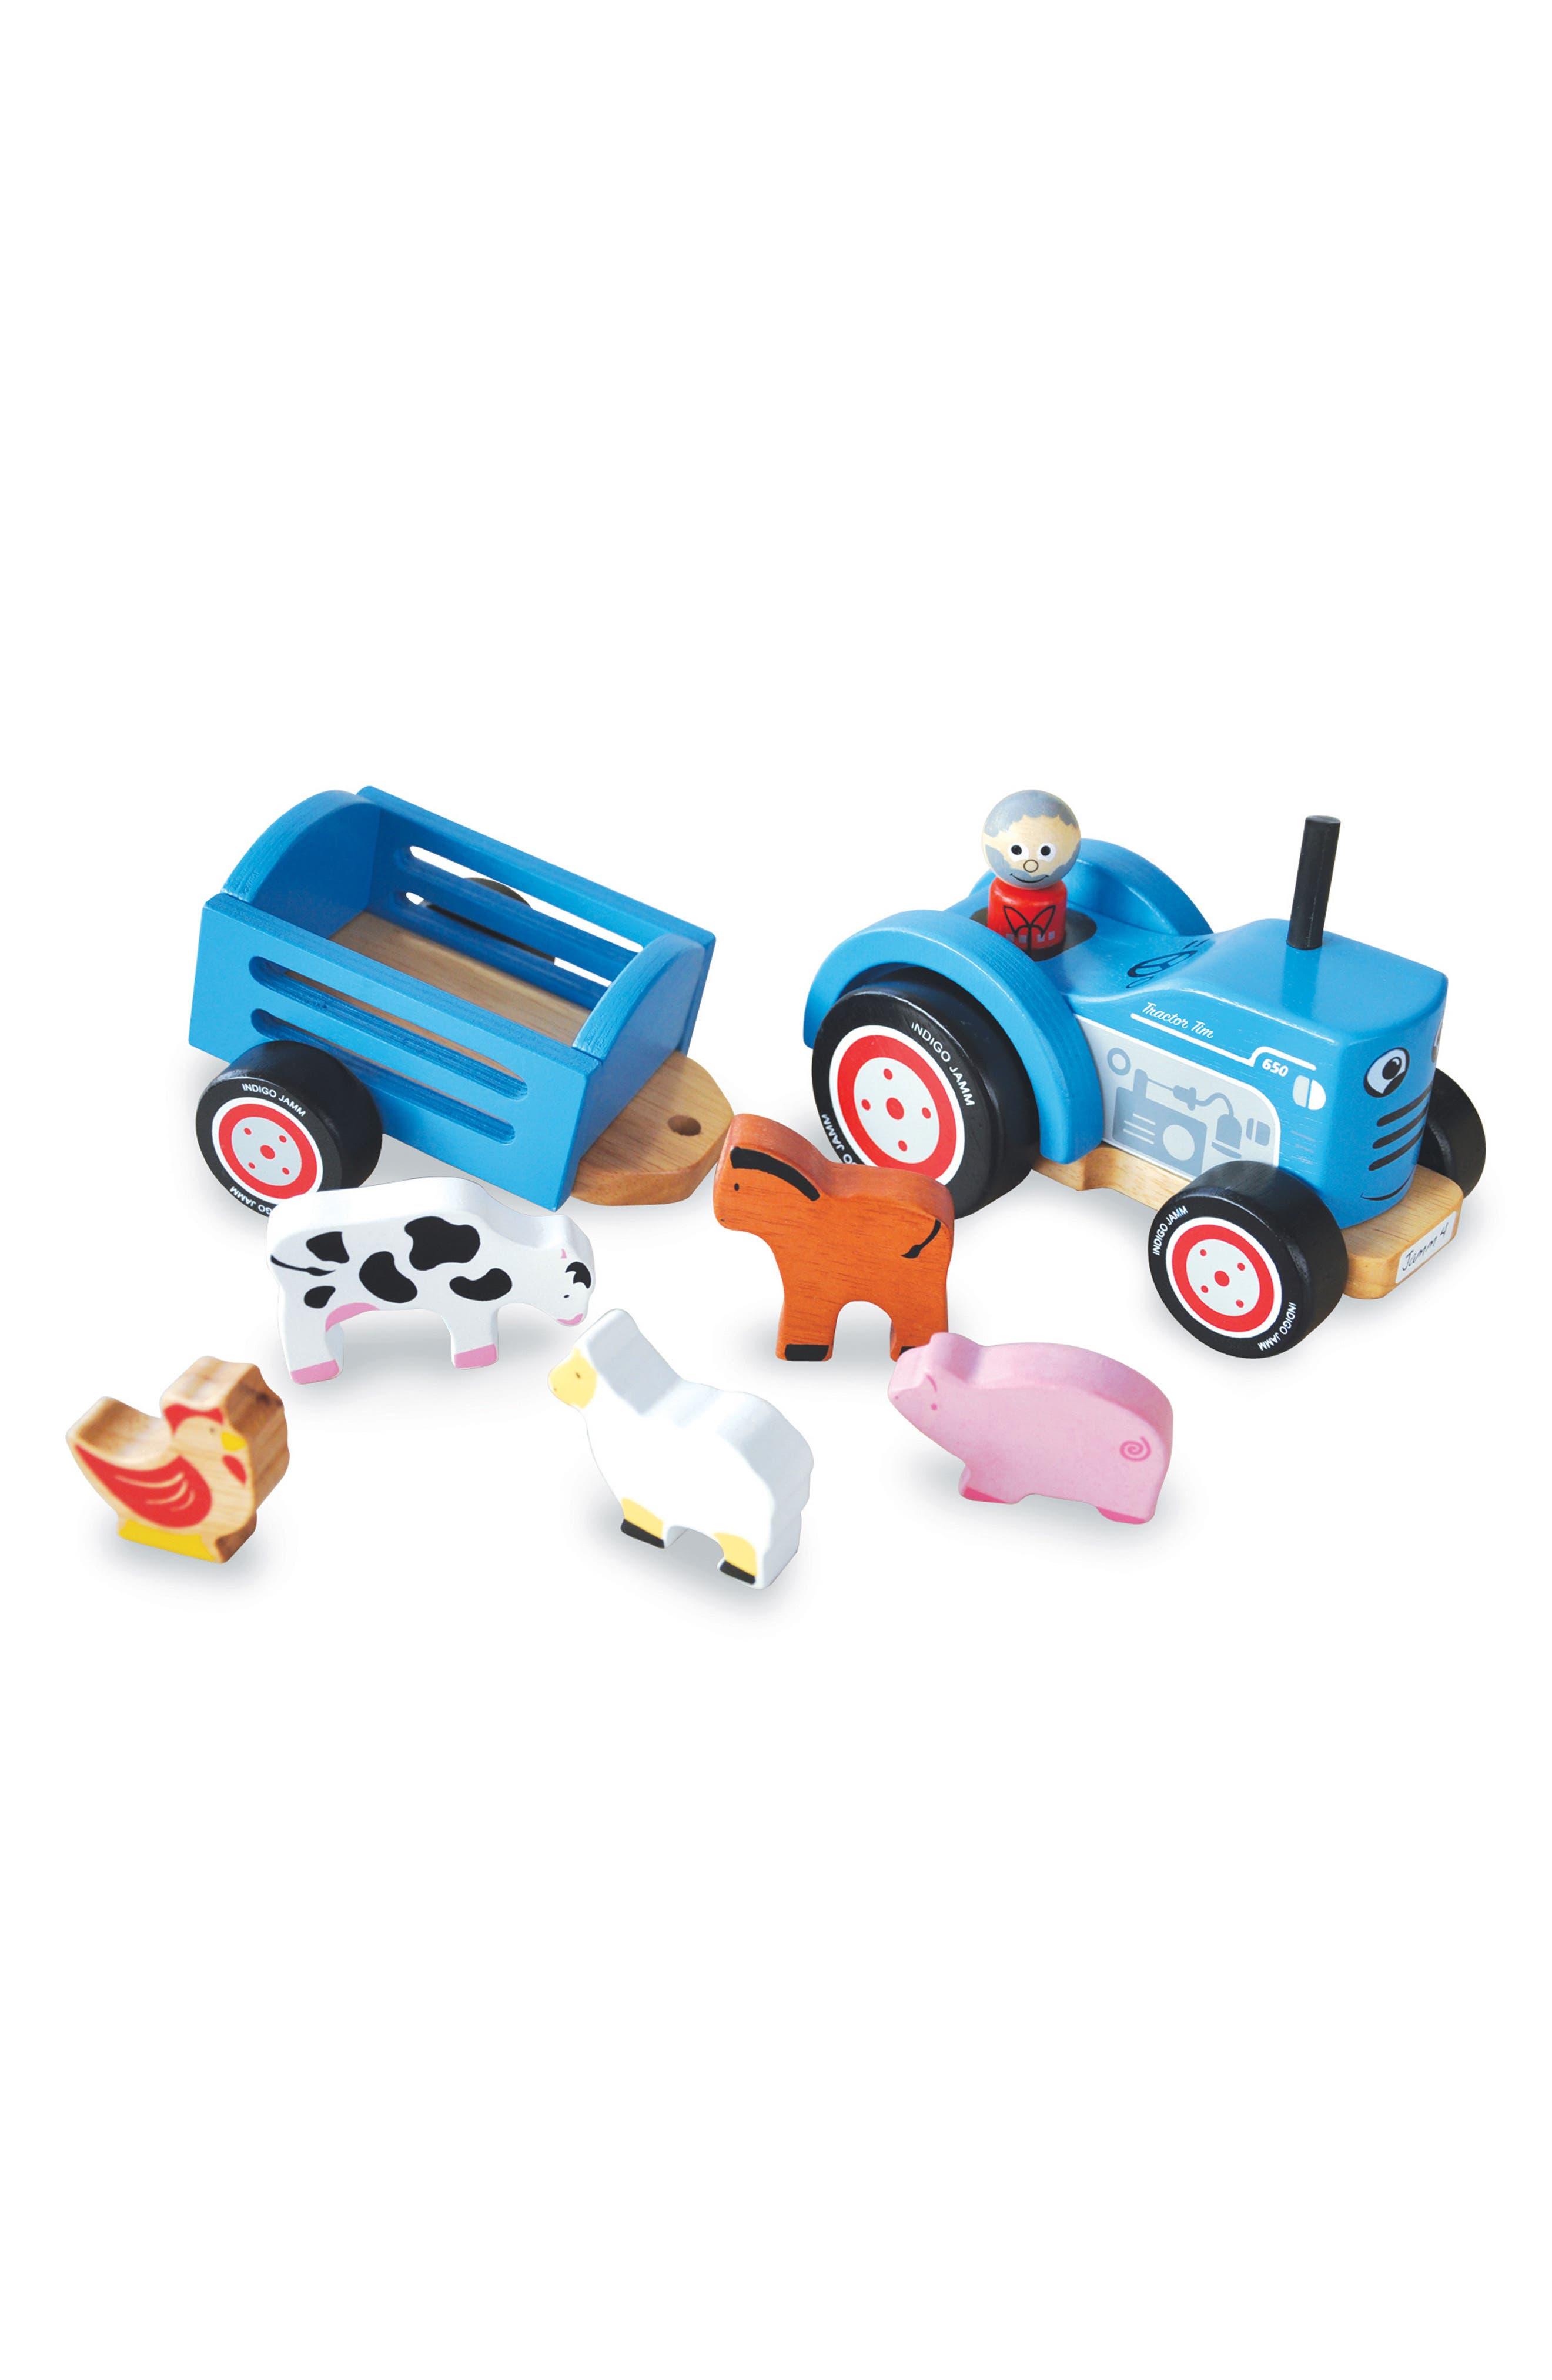 Main Image - Indigo Jamm Wooden 8-Piece Farm Tractor Play Set